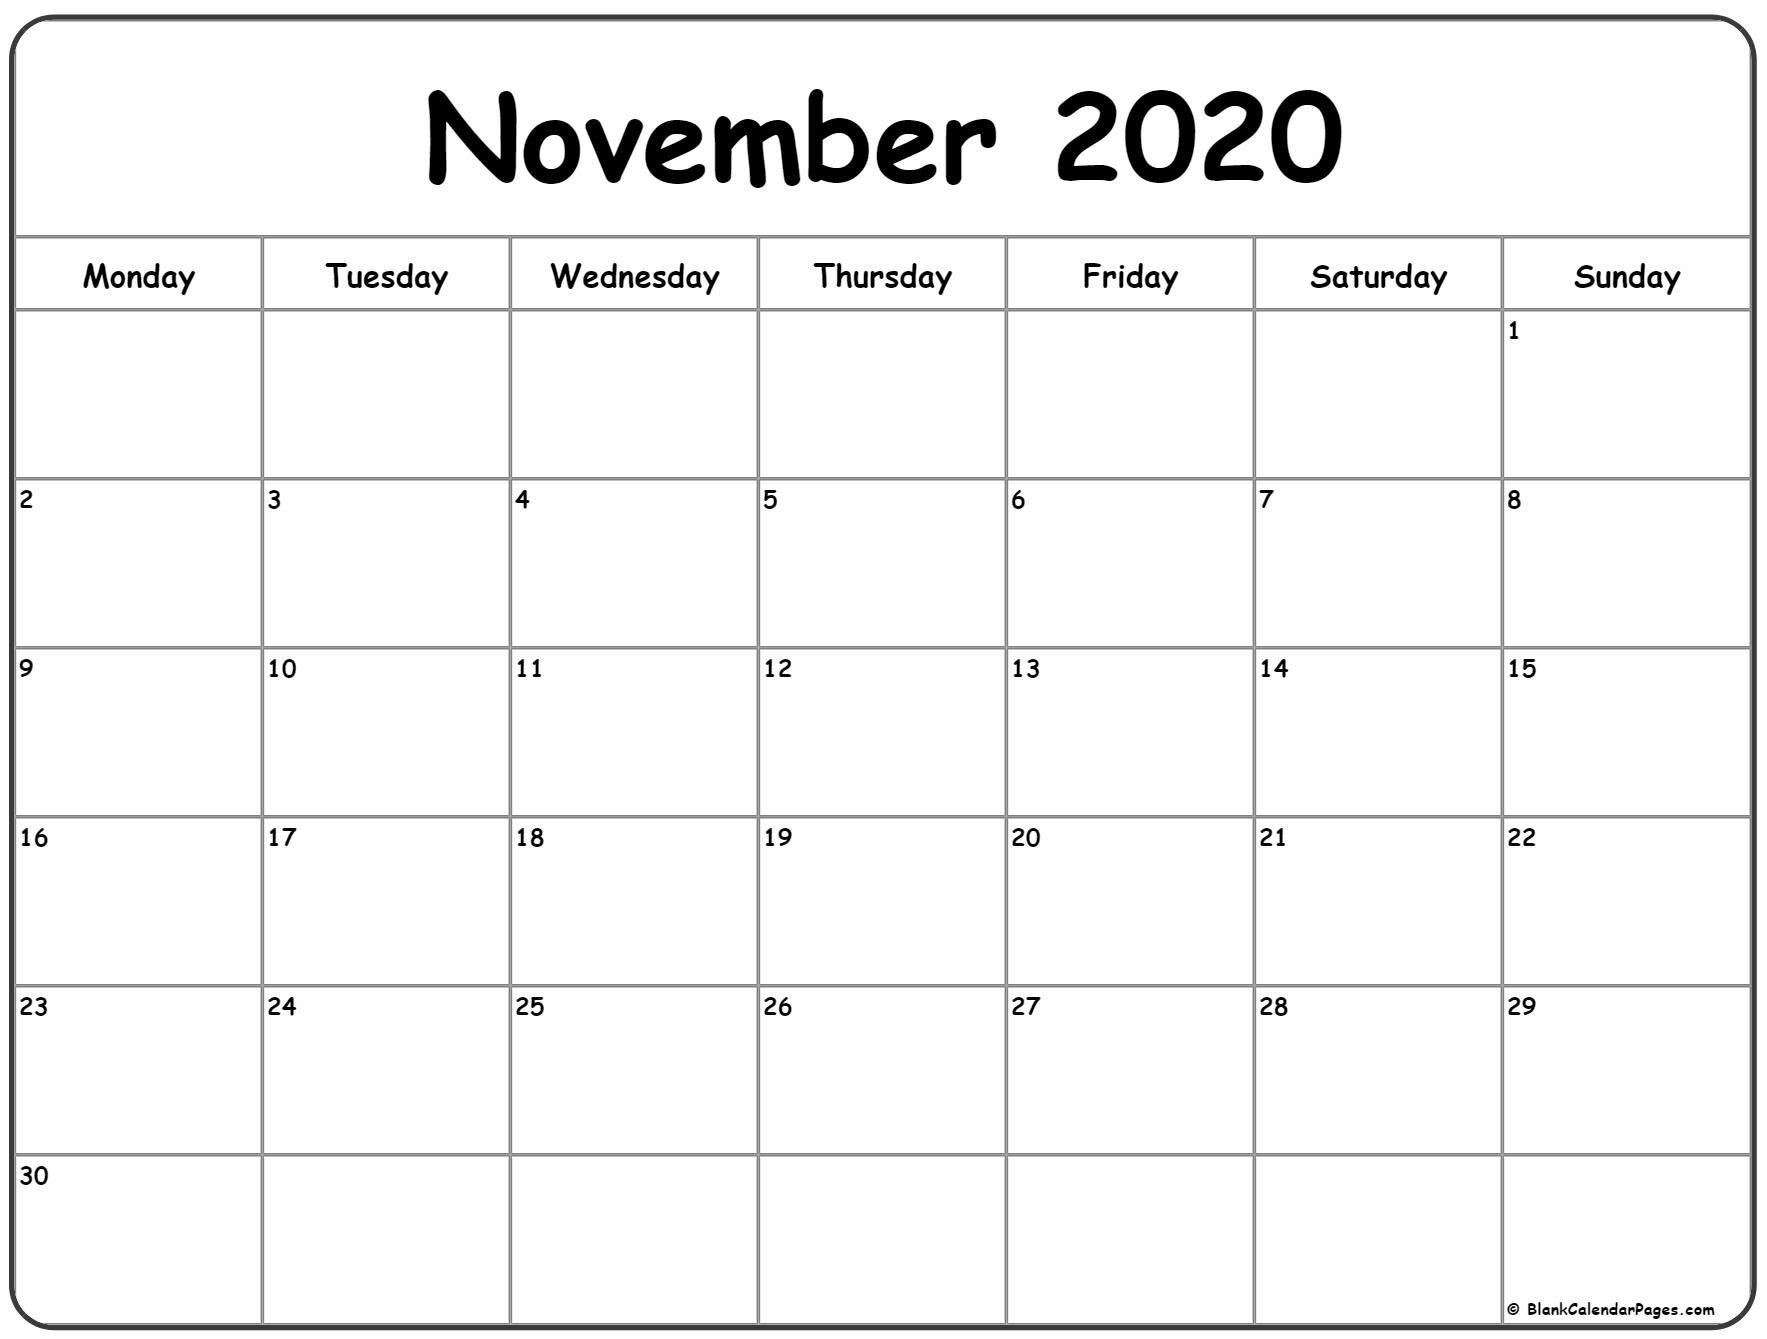 November 2020 Monday Calendar   Monday To Sunday In 2020 regarding 2020 Month Calendar Sunday Through Saturday